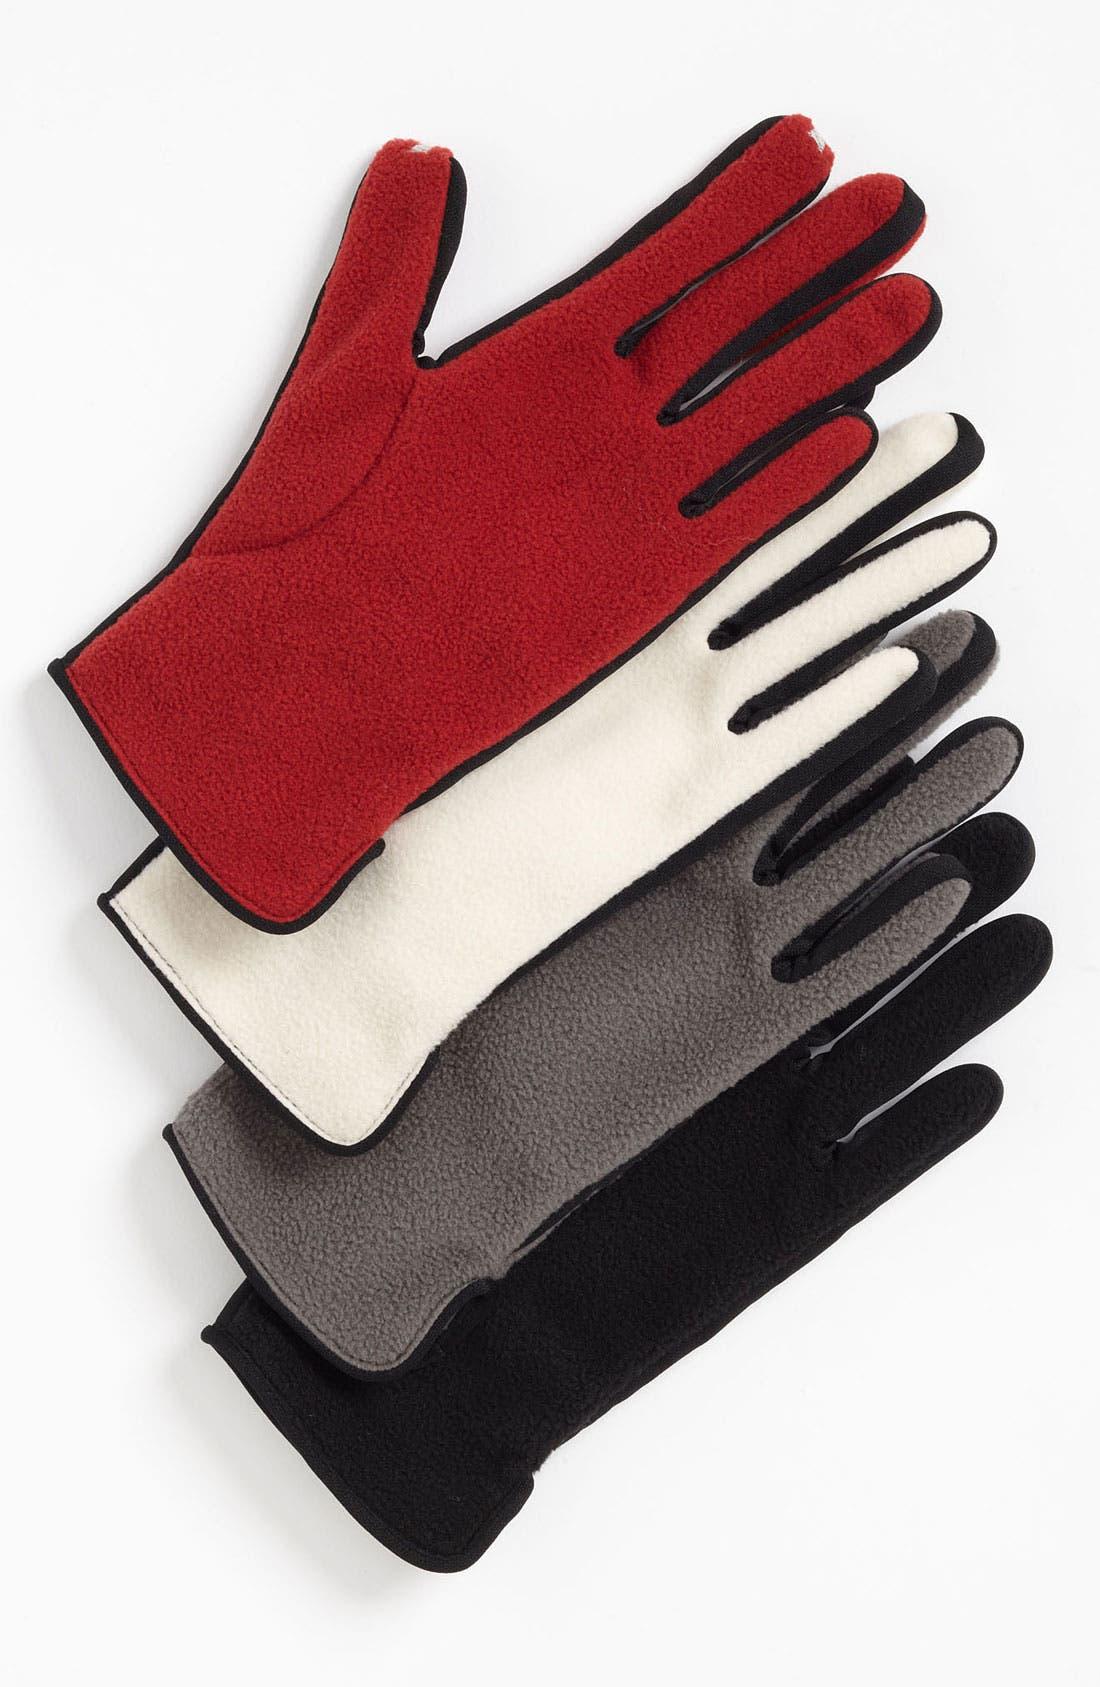 Main Image - Grandoe Gloves 'Psyche' Tech Gloves